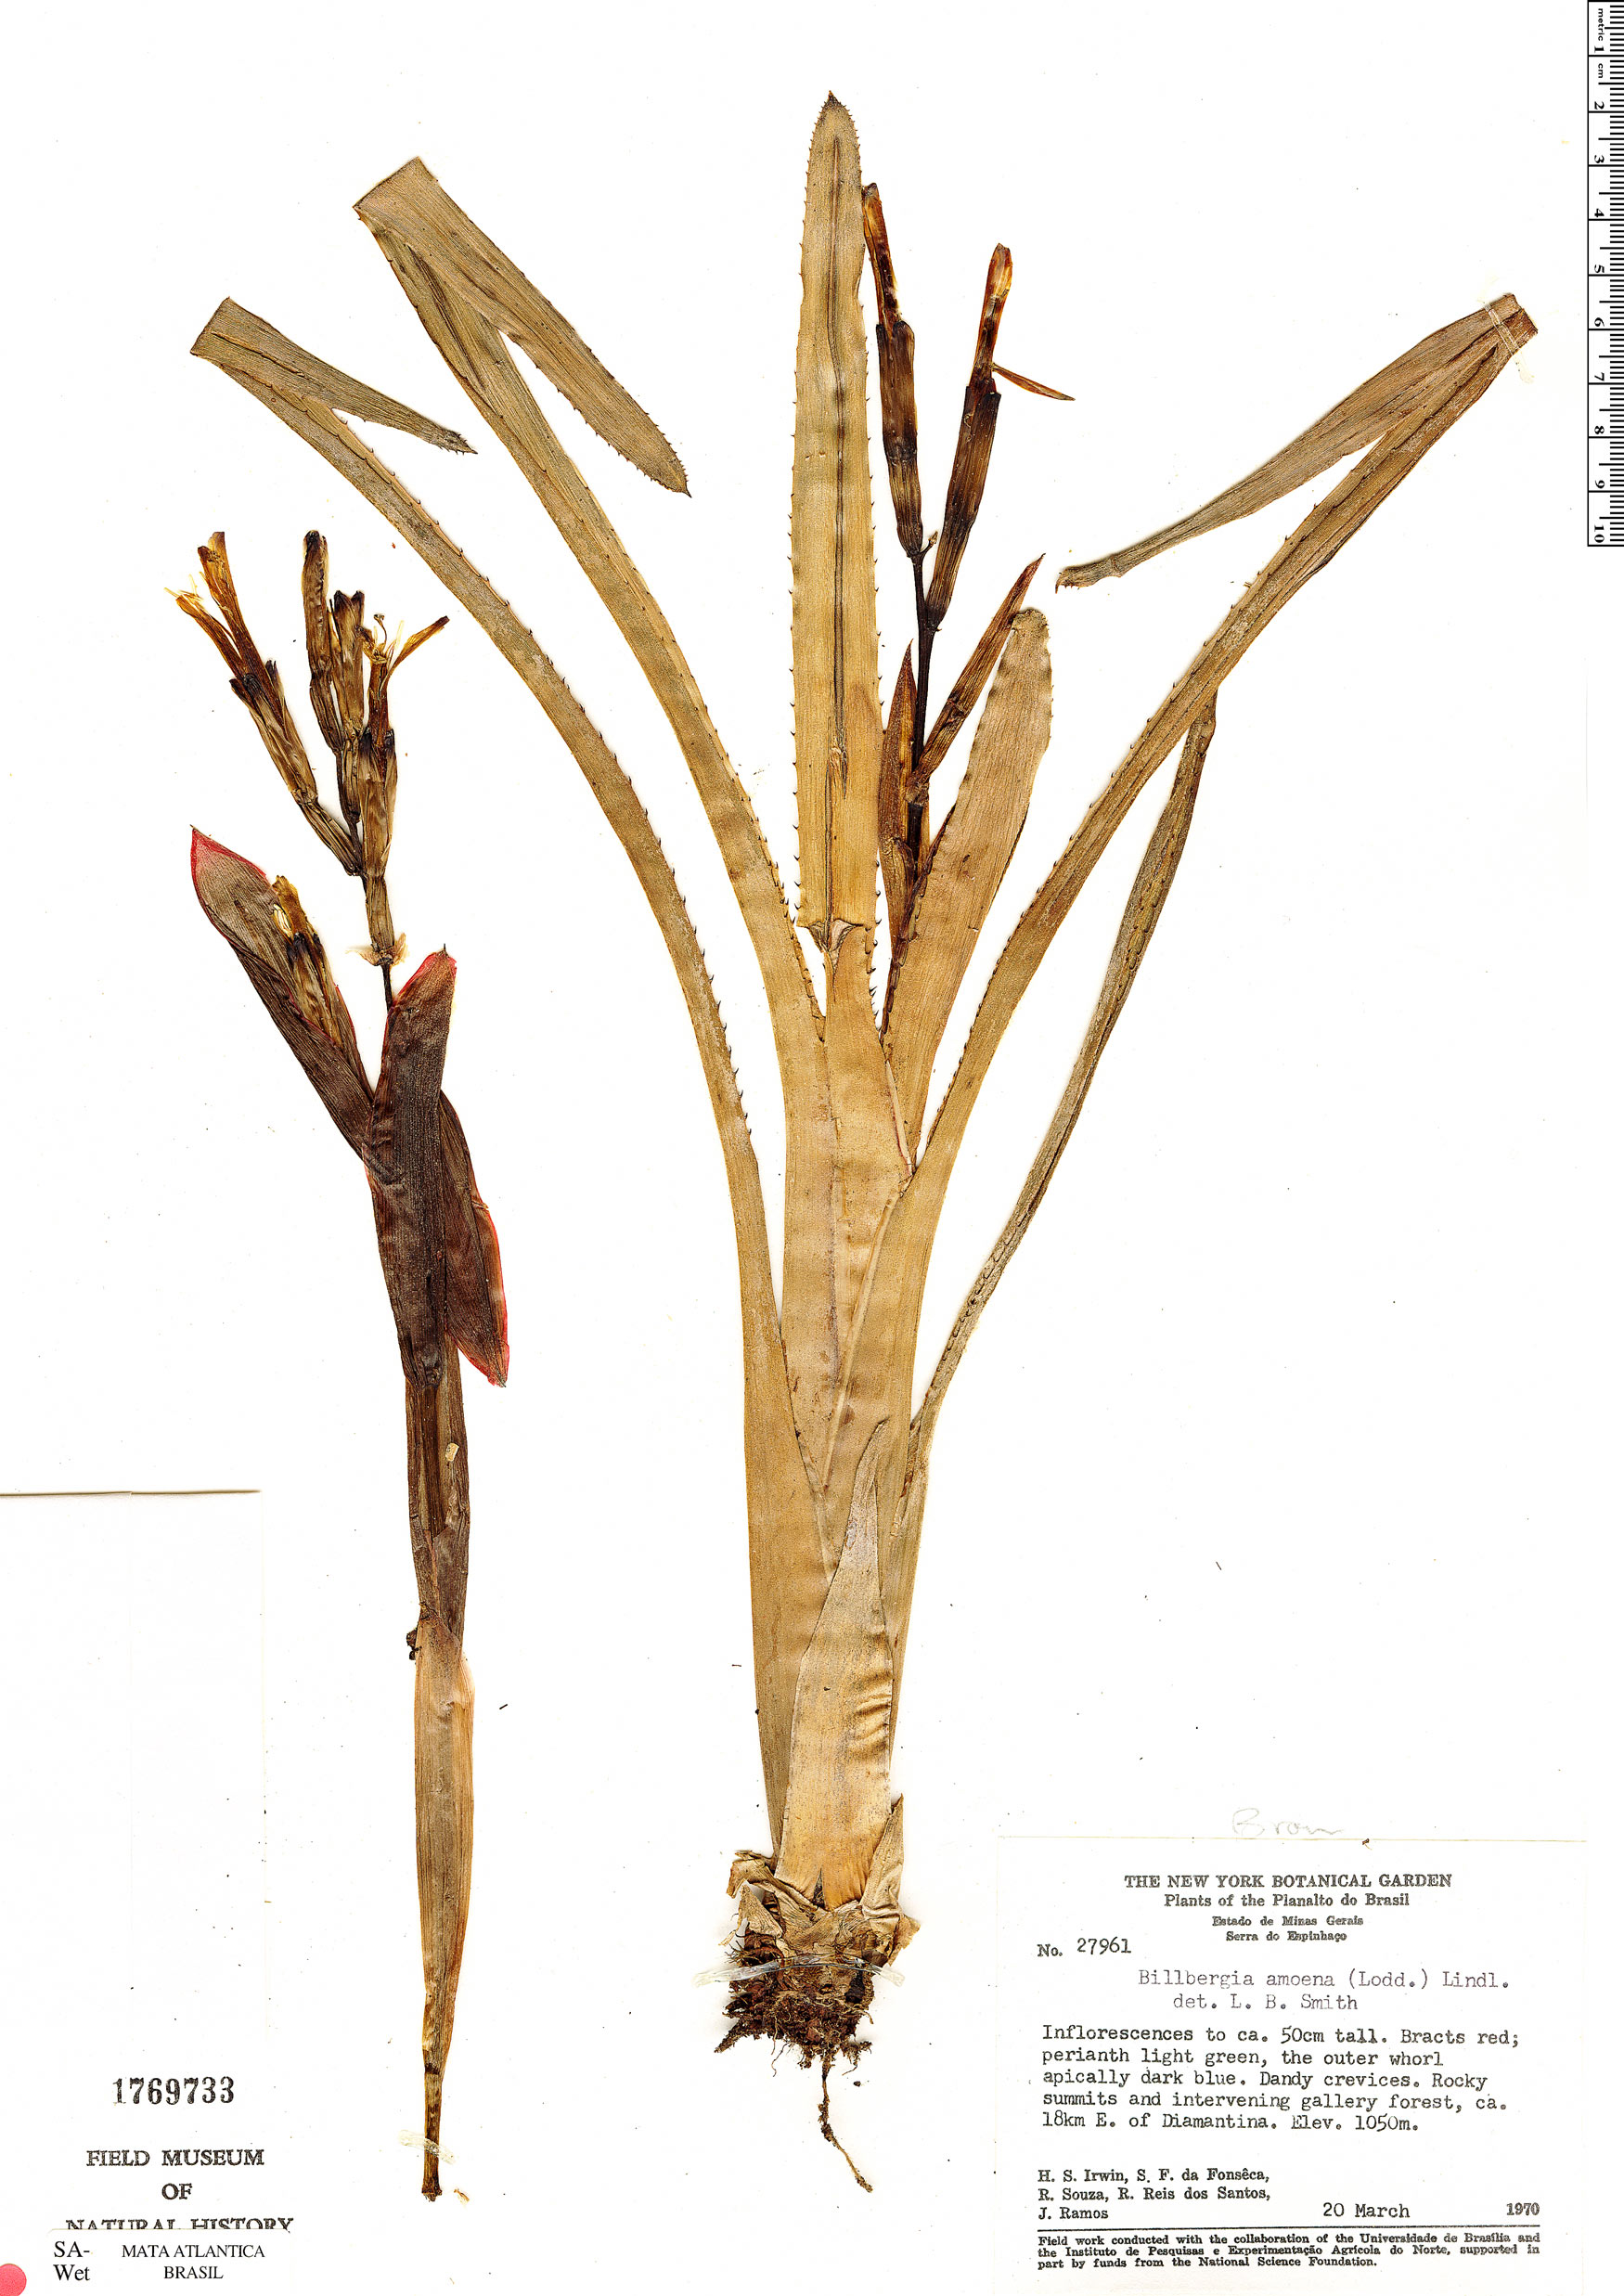 Specimen: Billbergia amoena